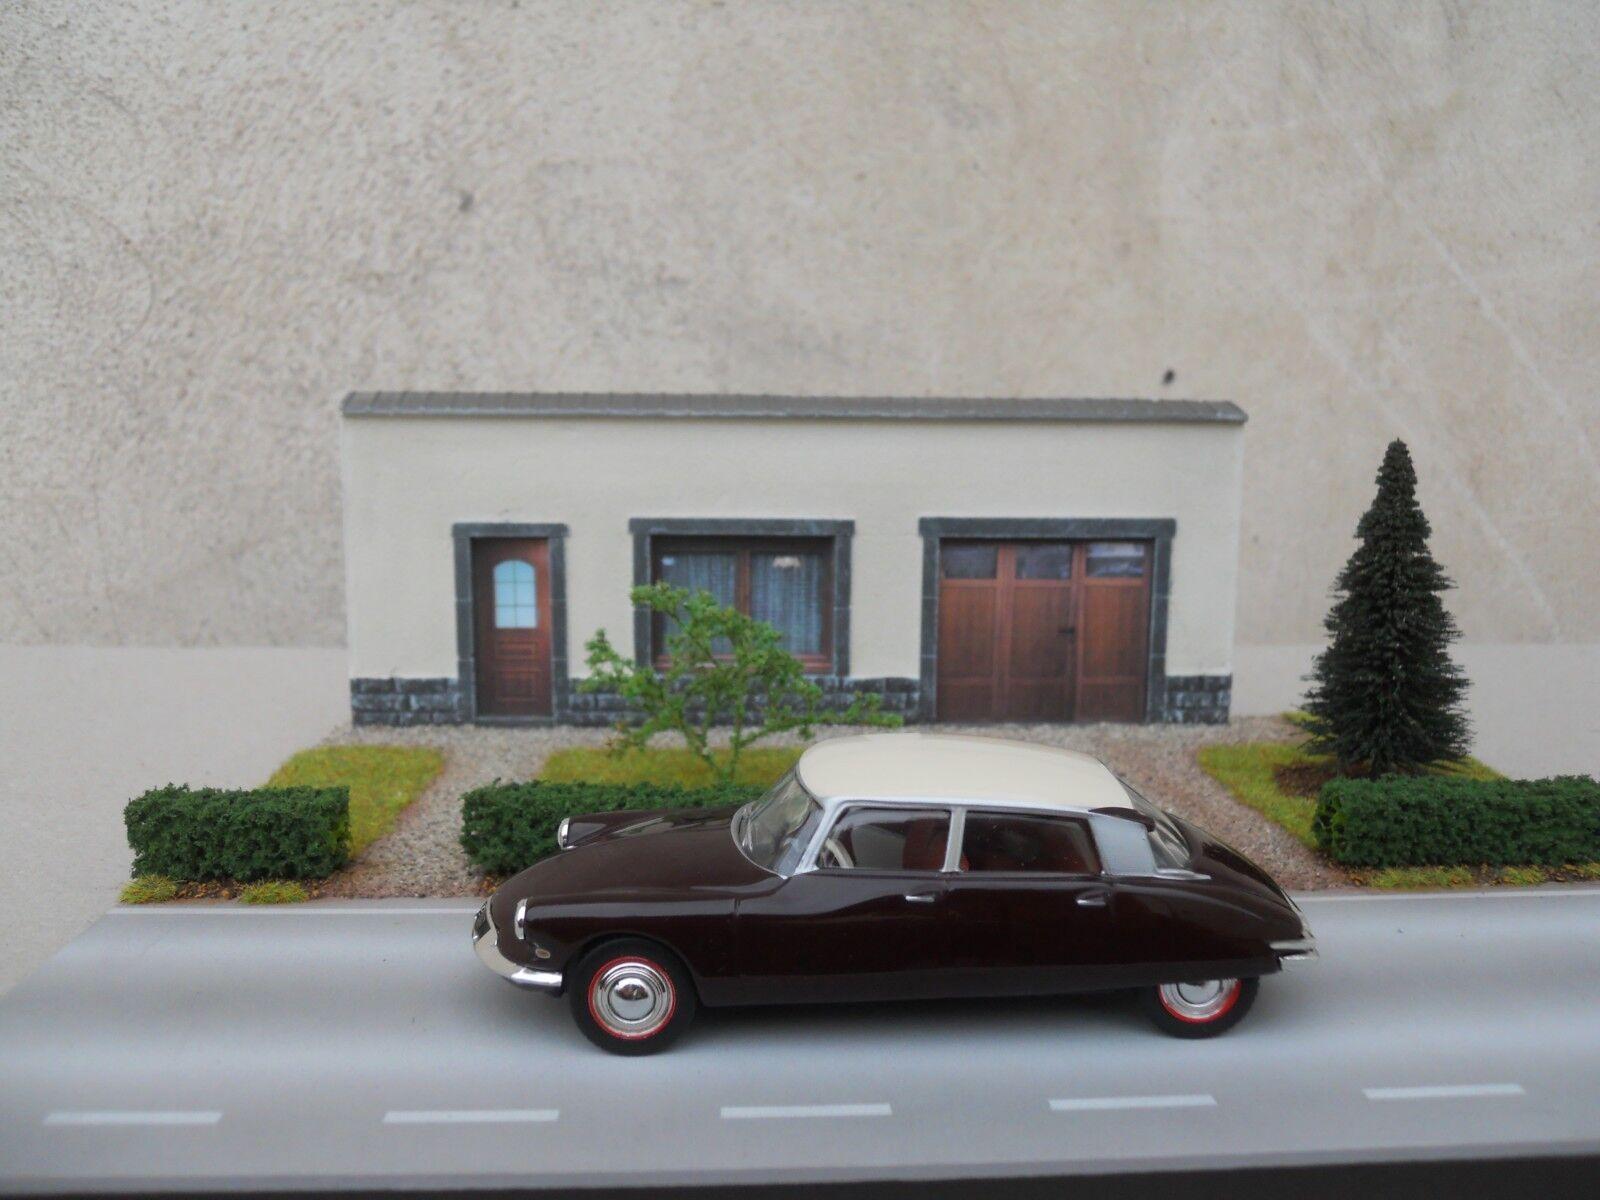 DIORAMA Fahrzeuge 1 43 N° 22 L 27 X l 20 X H 9,5 cm Fassade weiß